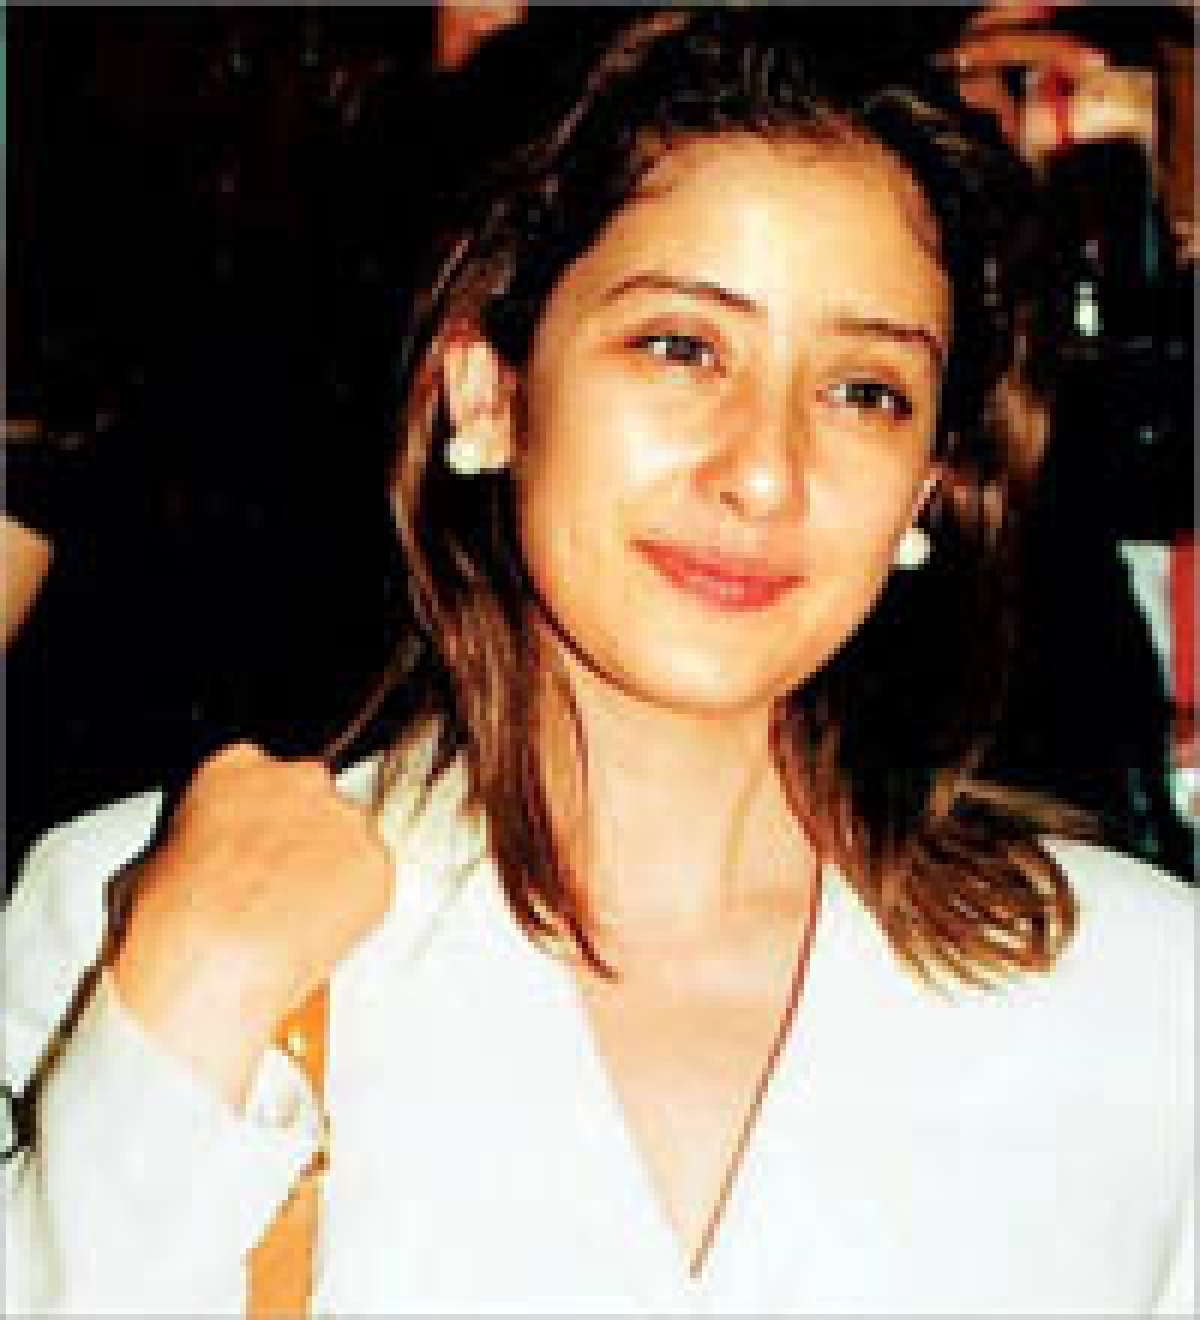 Manisha Koirala shooting her next in Shimla